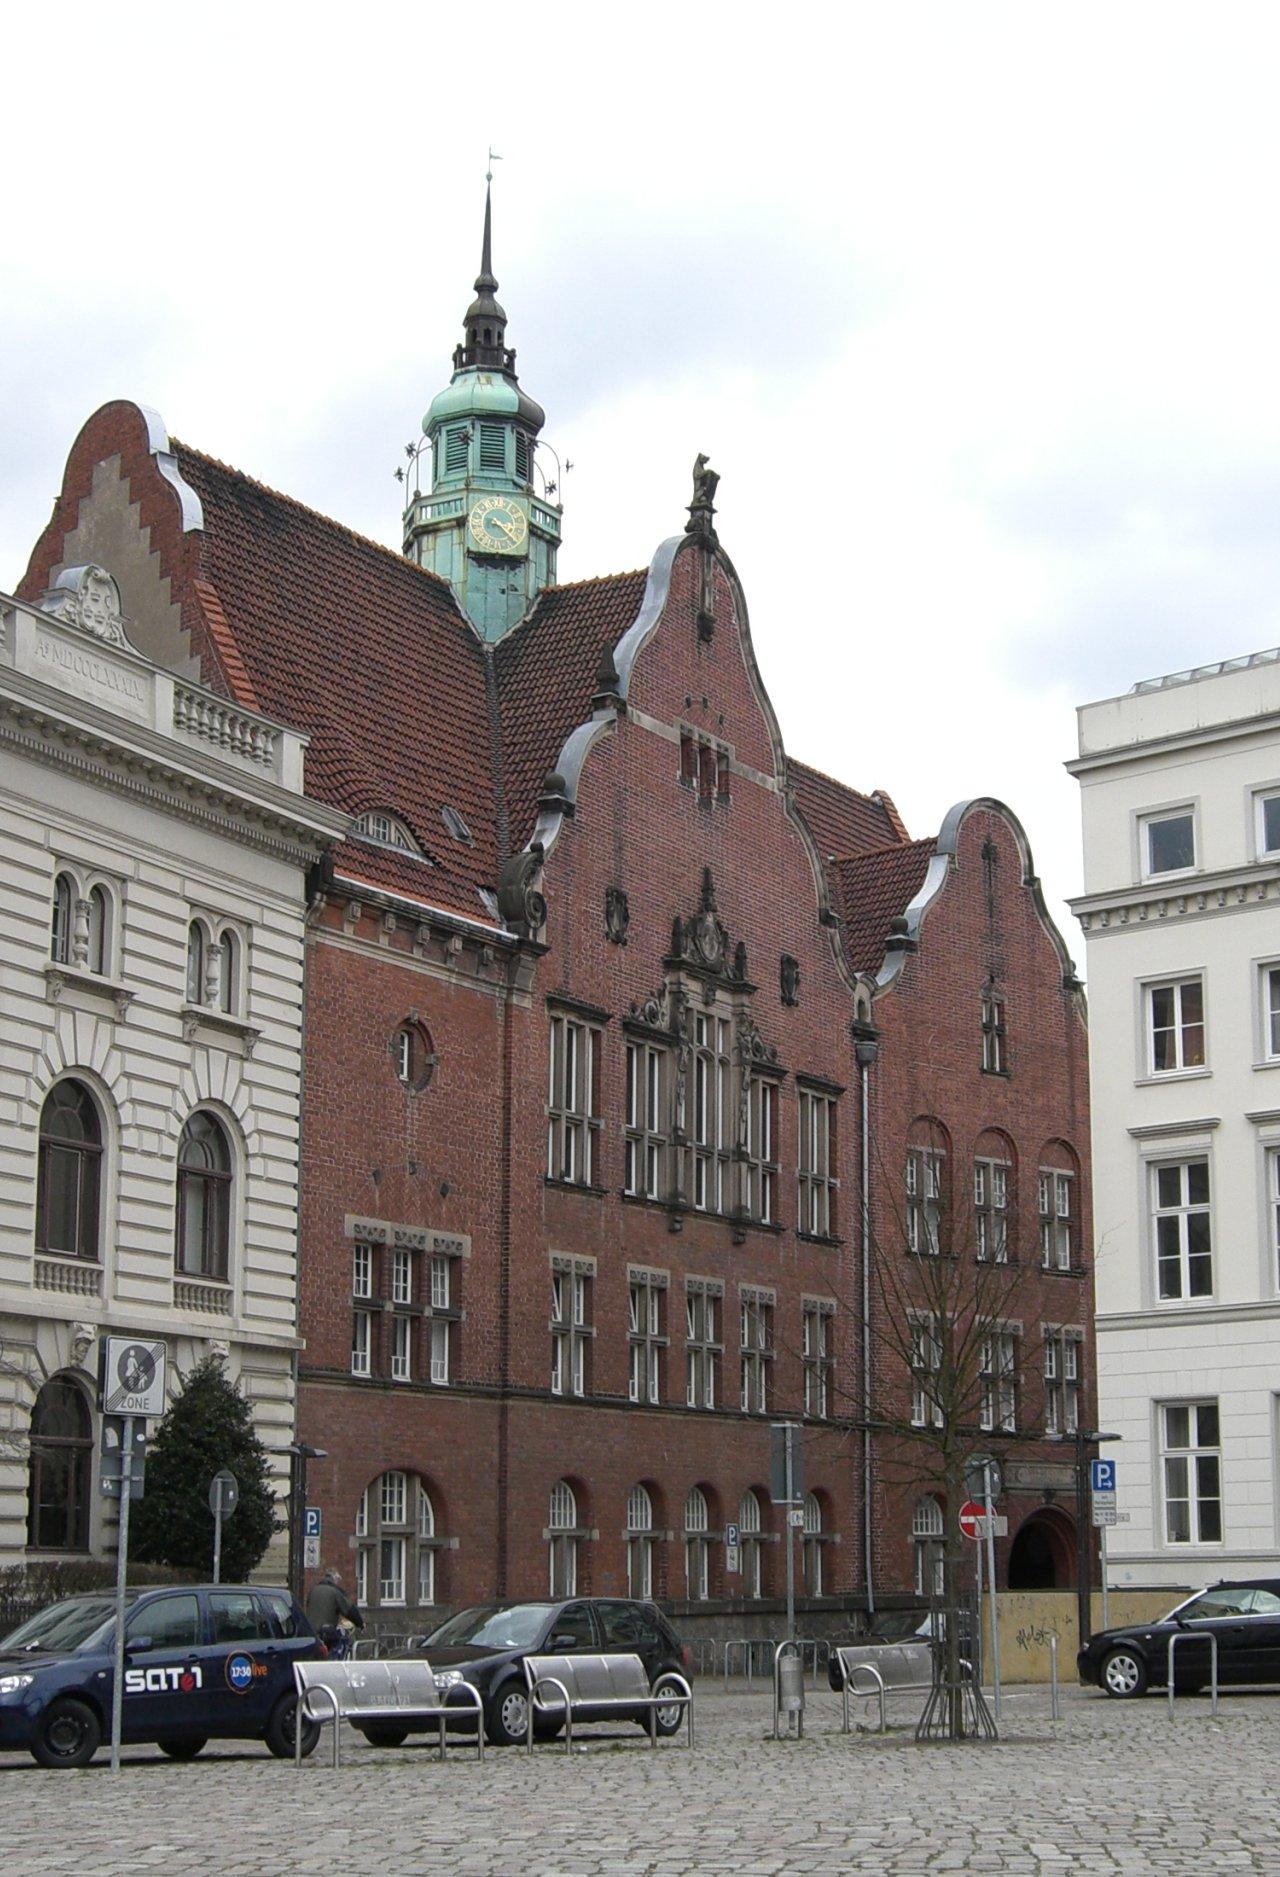 Koberg (Lübeck)